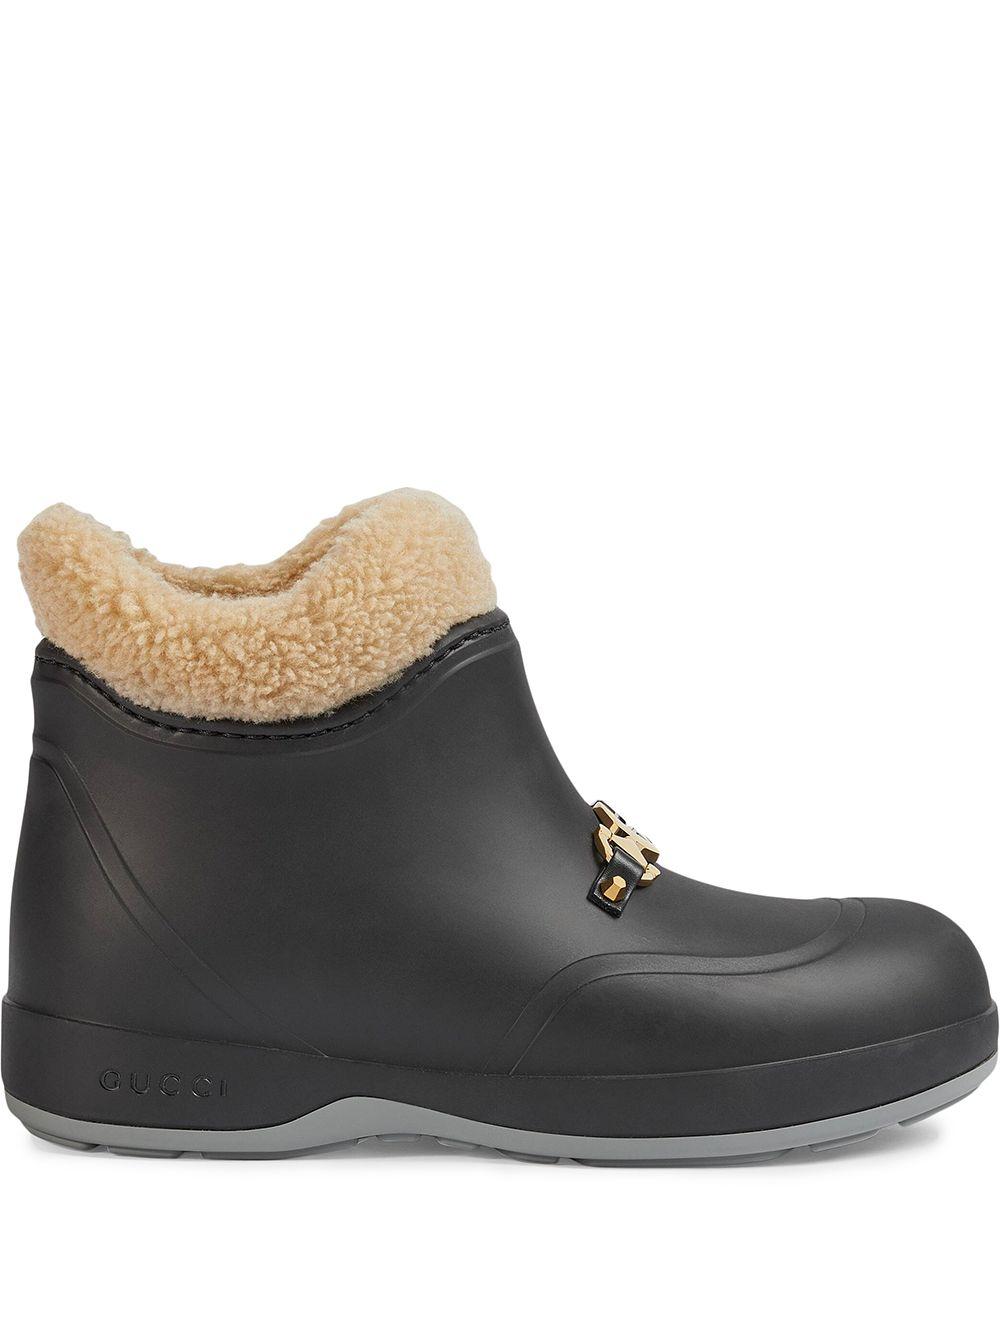 Horsebit-embellished Ankle Boots